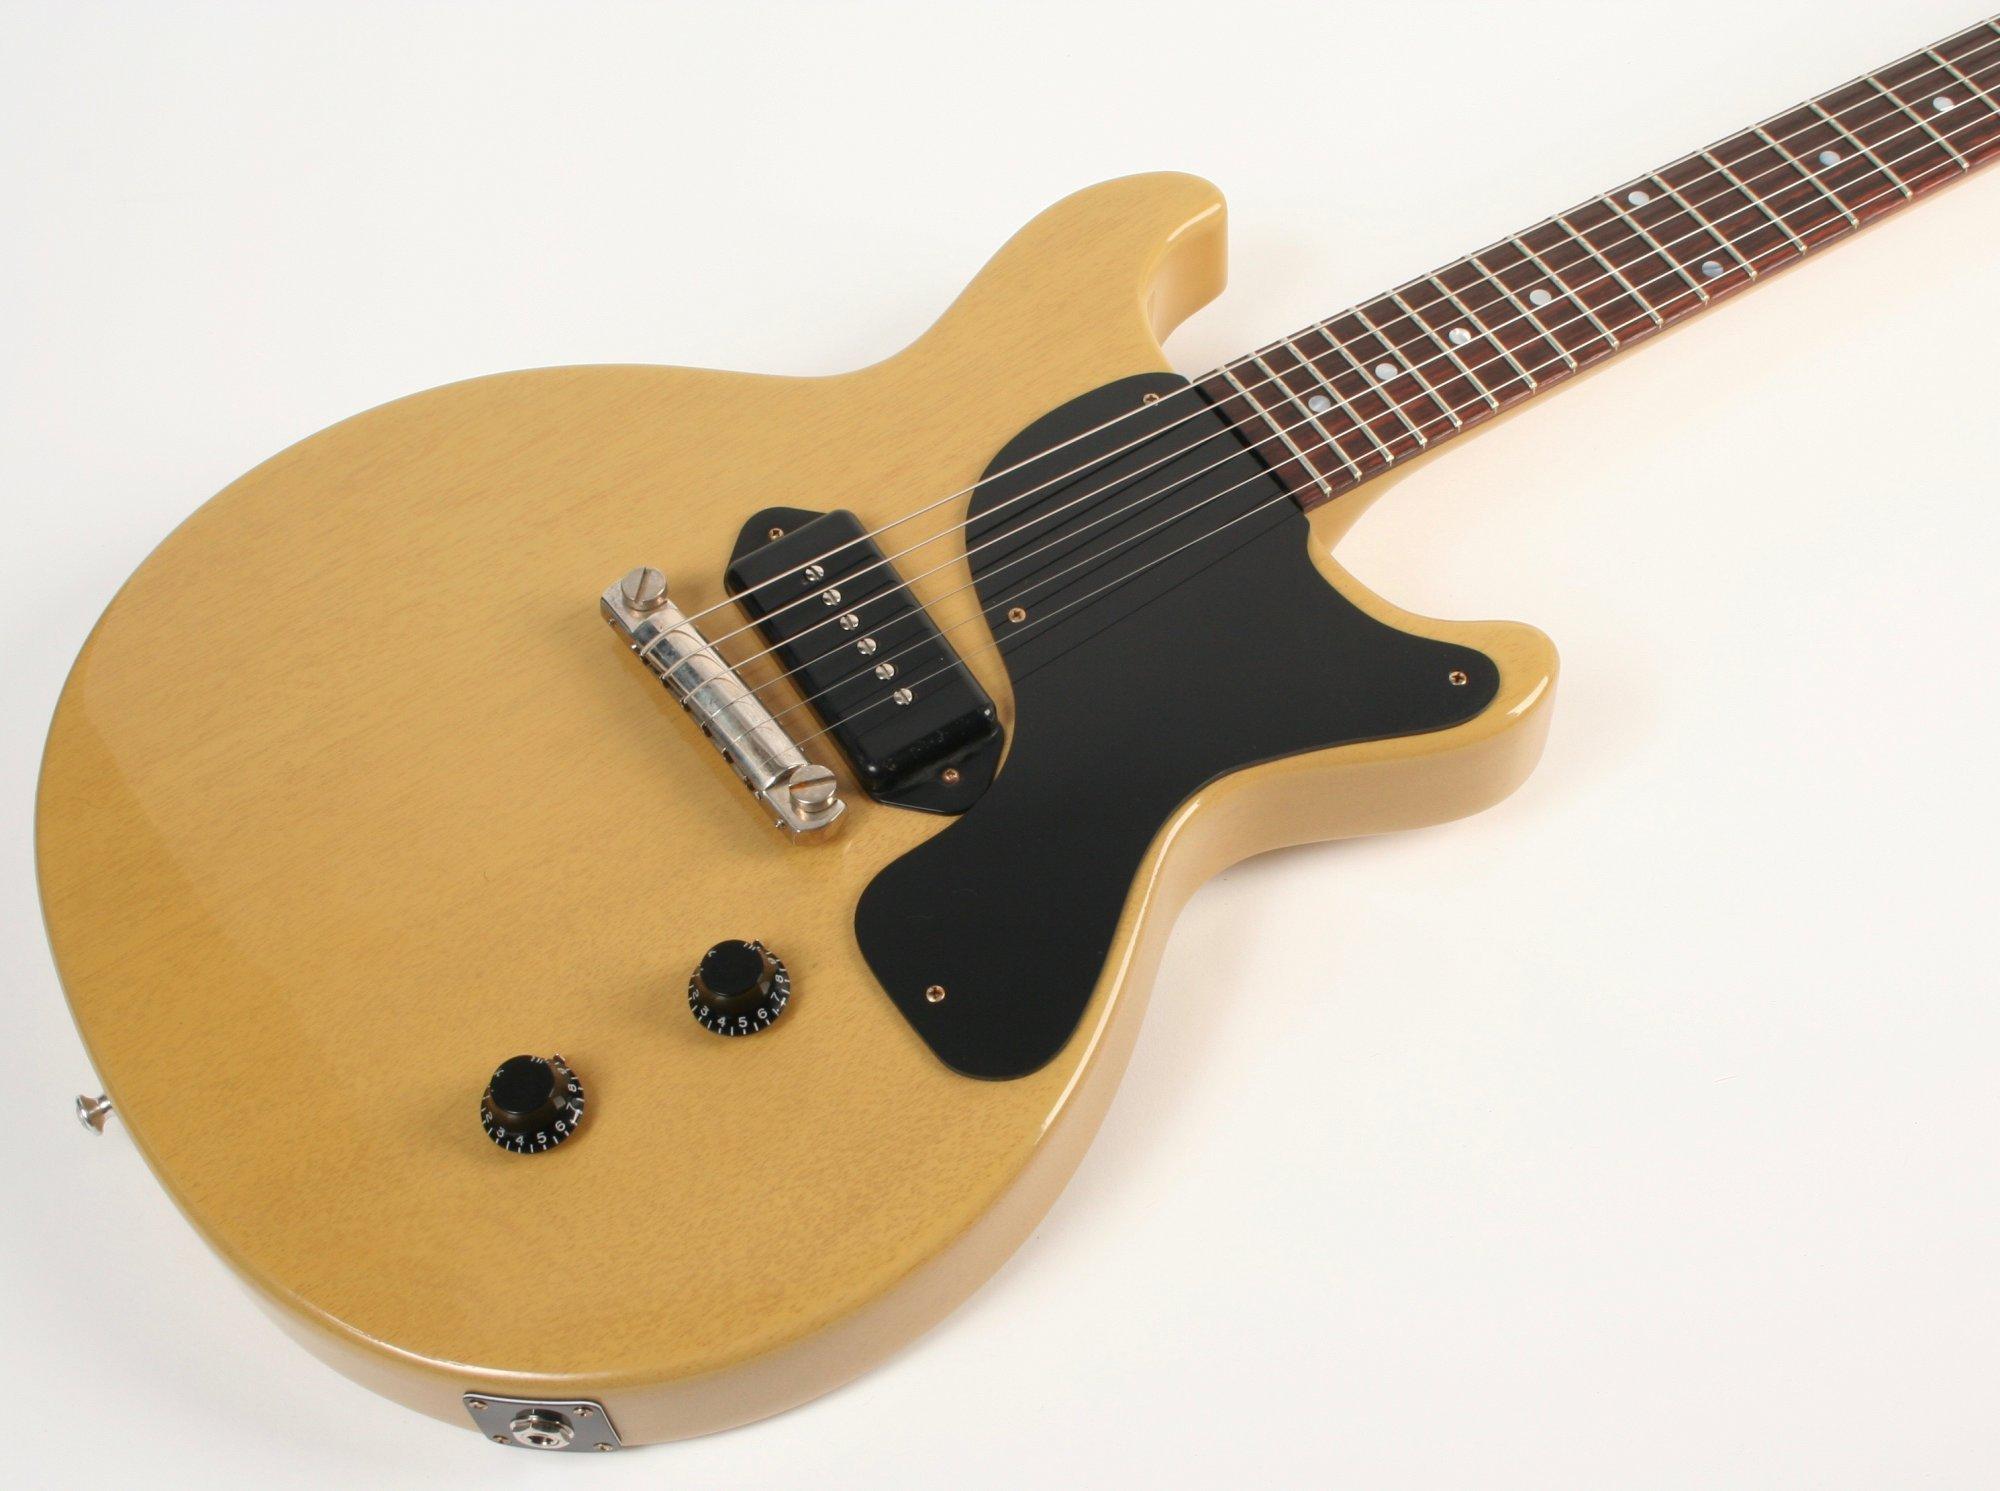 Gibson Custom Shop 1958 Les Paul Junior Double Cut Reissue VOS TV Yellow